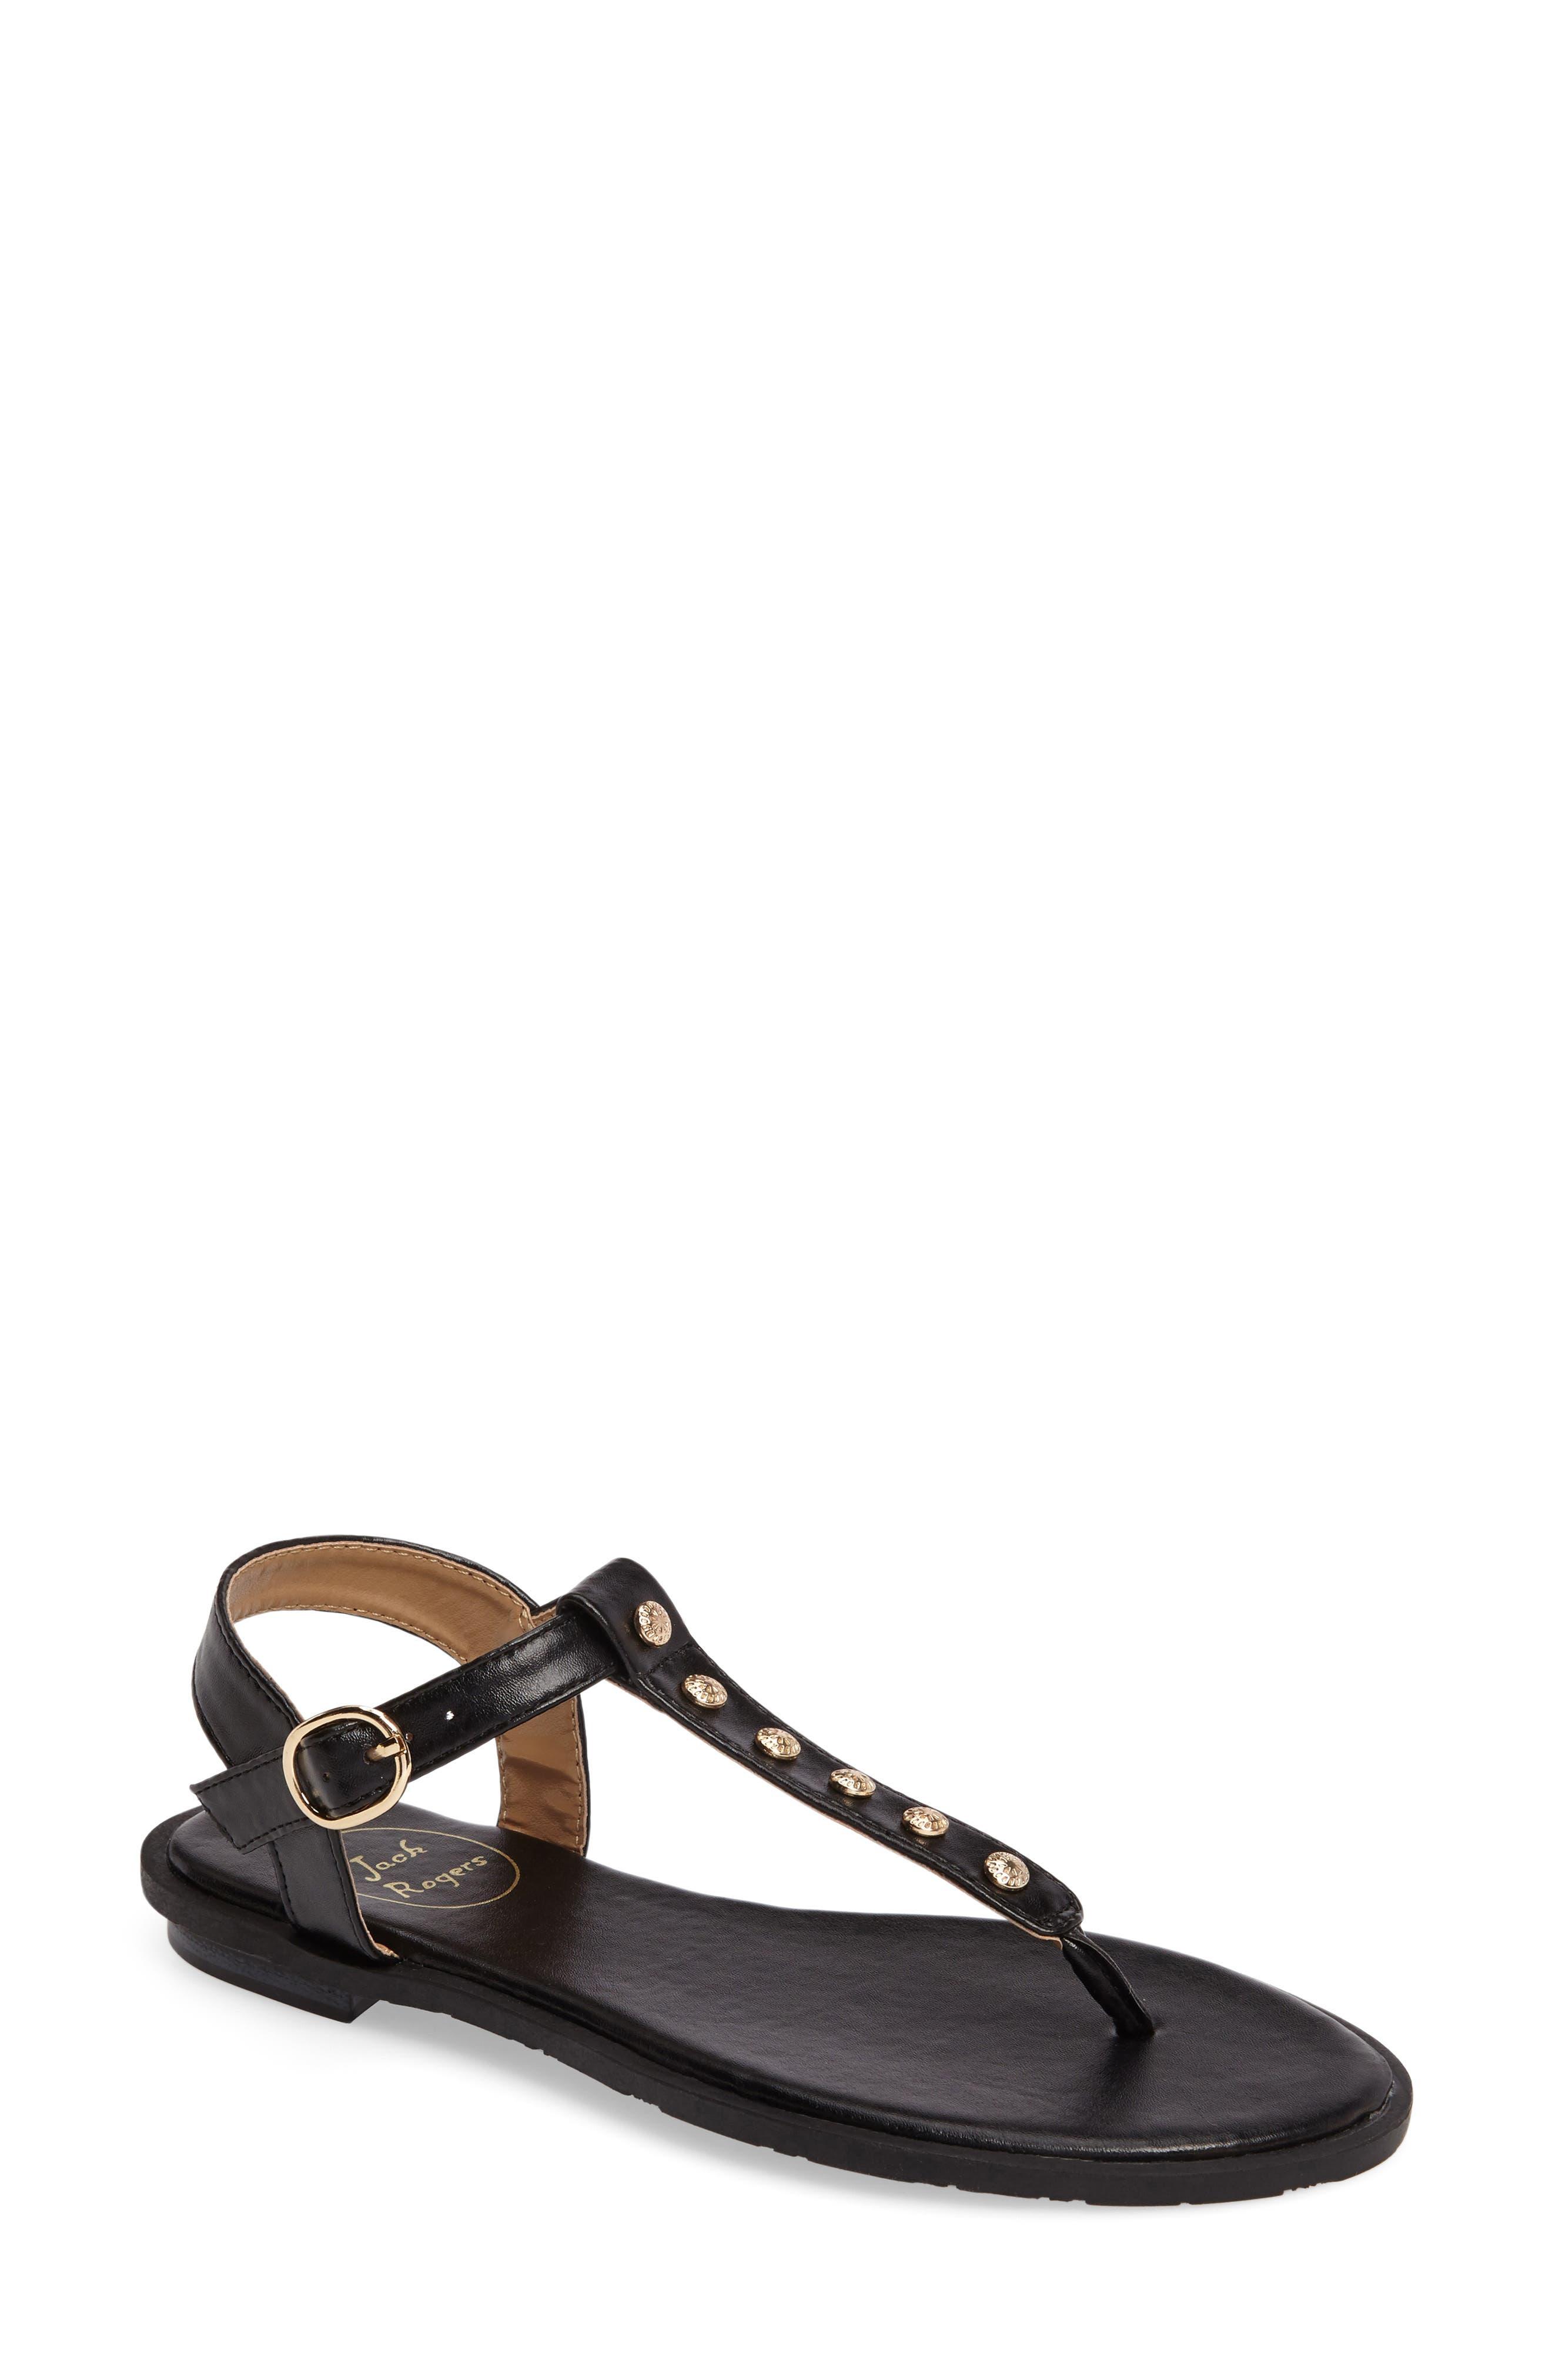 Kamri T-Strap Sandal,                         Main,                         color,